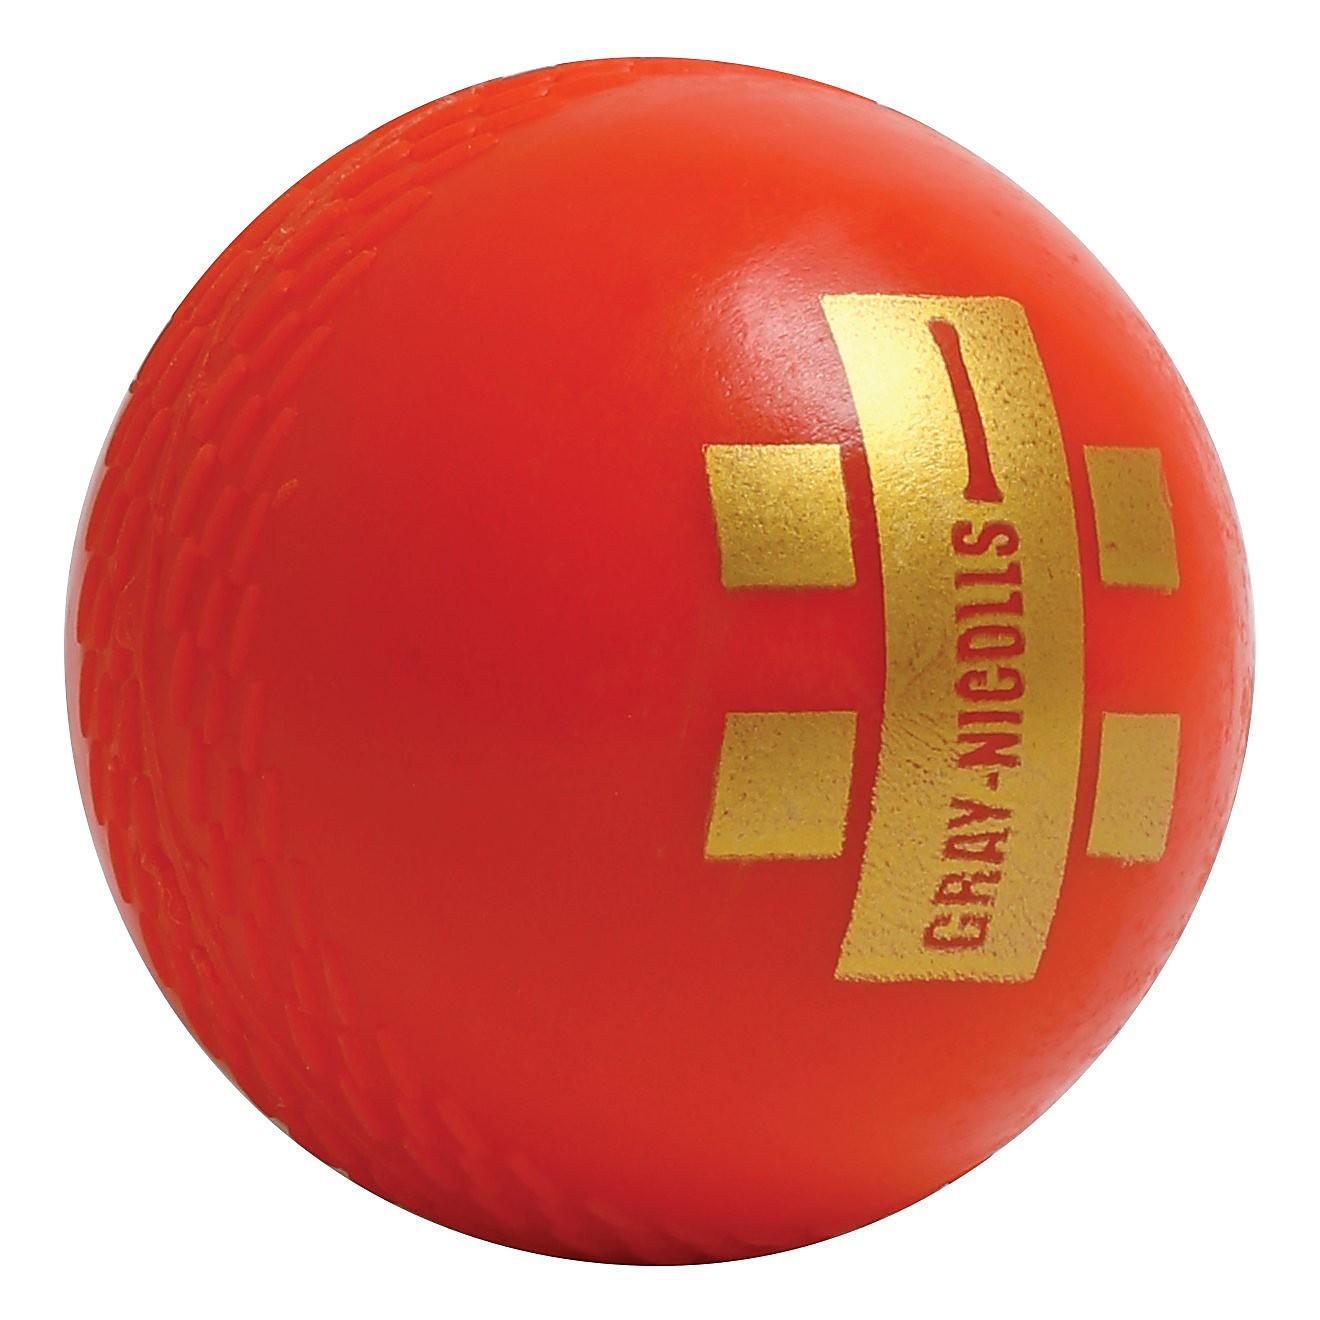 Gray Nicolls Test Crown Cricket Ball